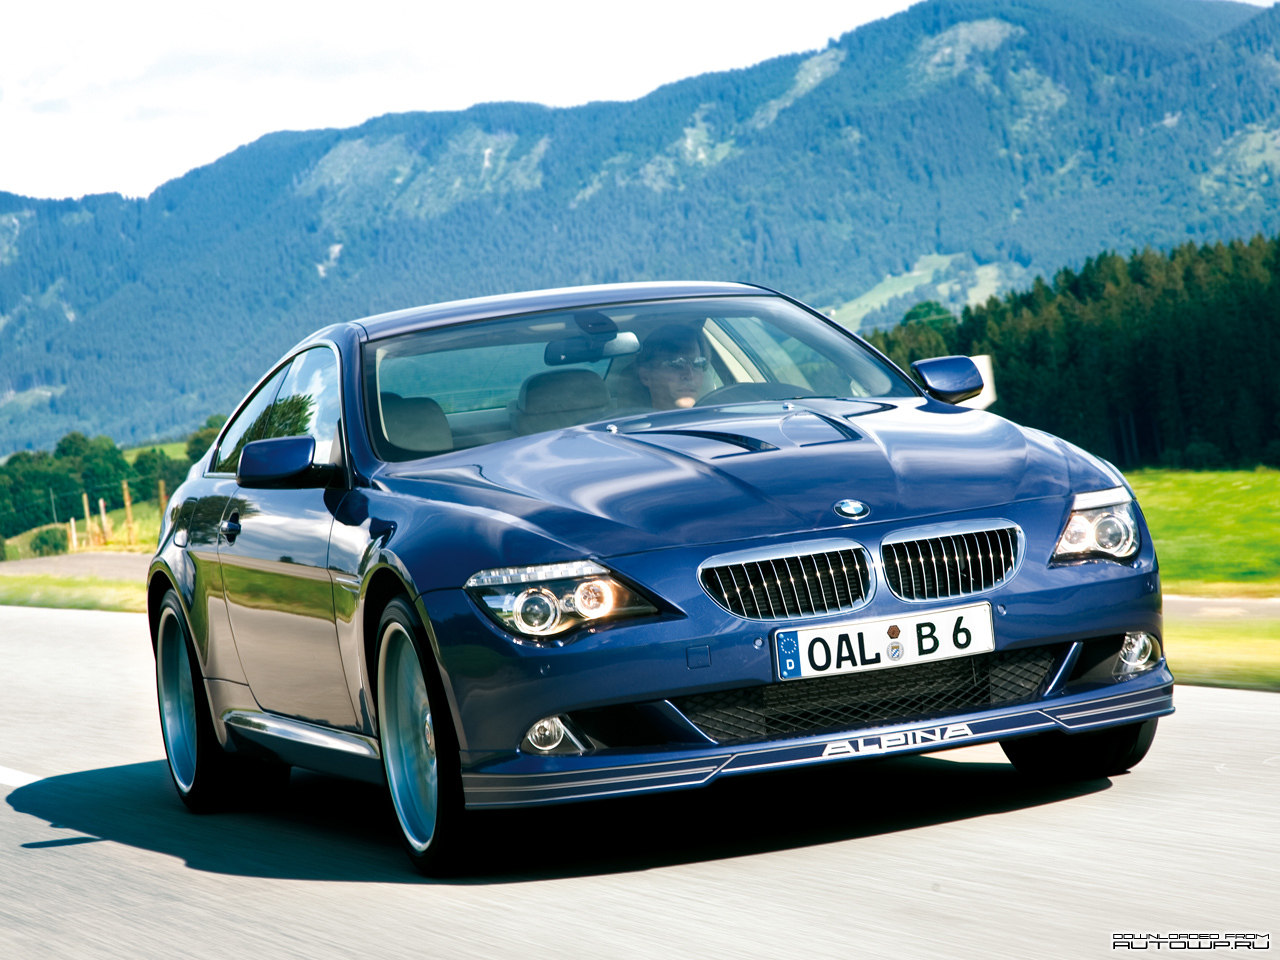 BMW Alpina B6 >> Alpina B6S Coupe (E63) photos - PhotoGallery with 4 pics ...